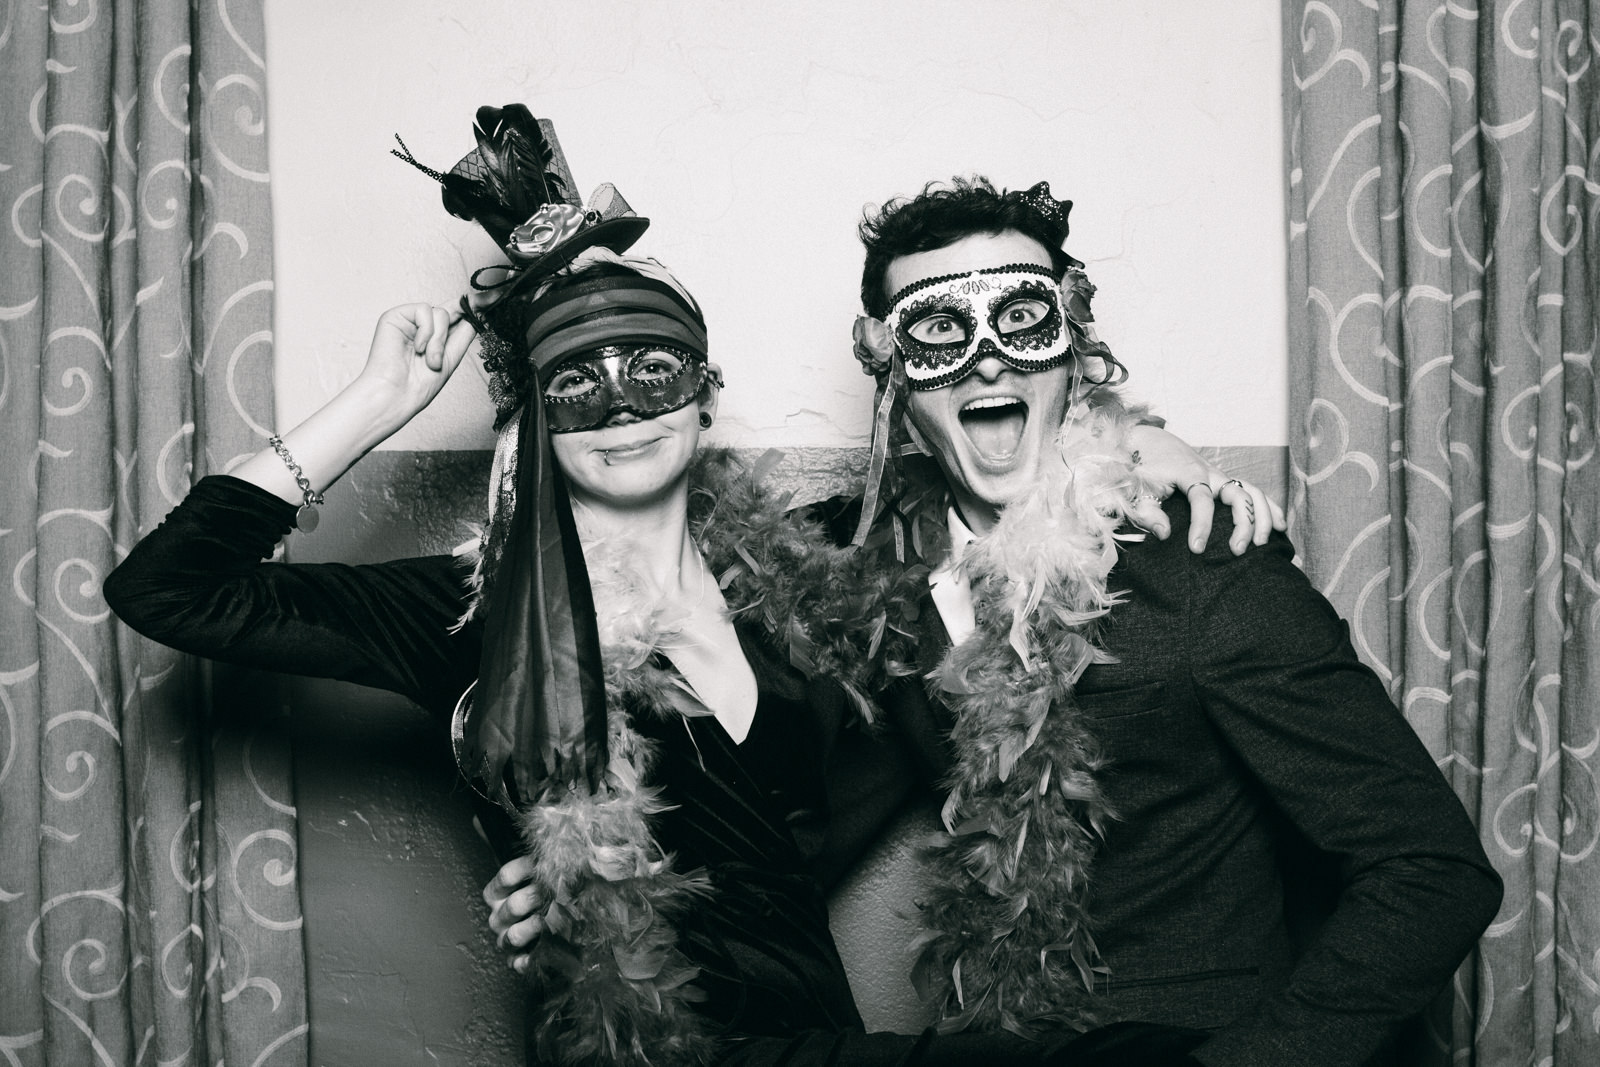 Tara-Dan-Wedding-Photo-Booth-Allentown-Brew-Works-1.jpg